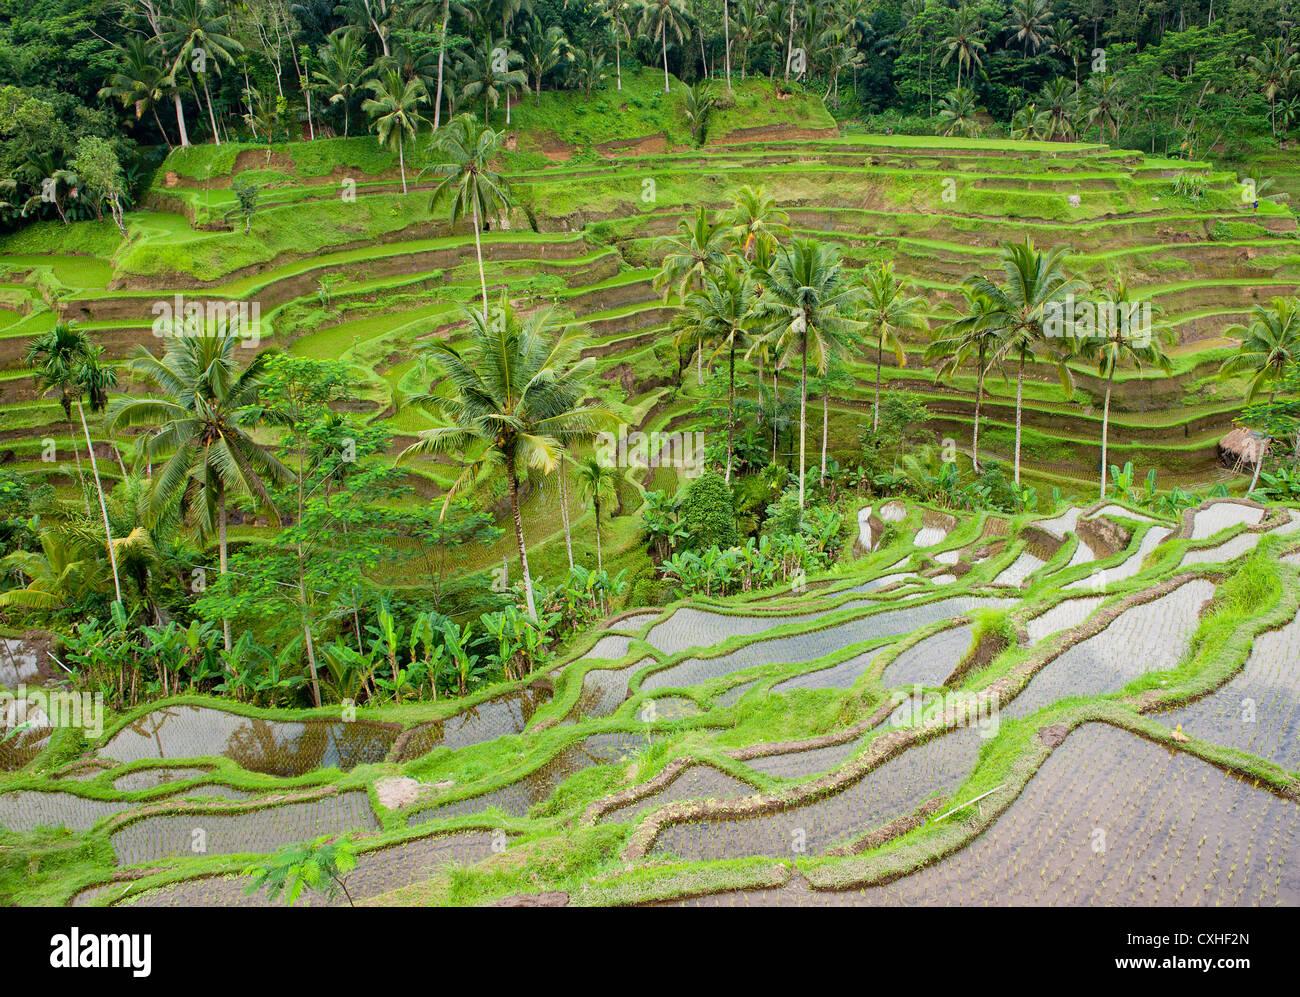 rice terraces of bali, indonesia - Stock Image